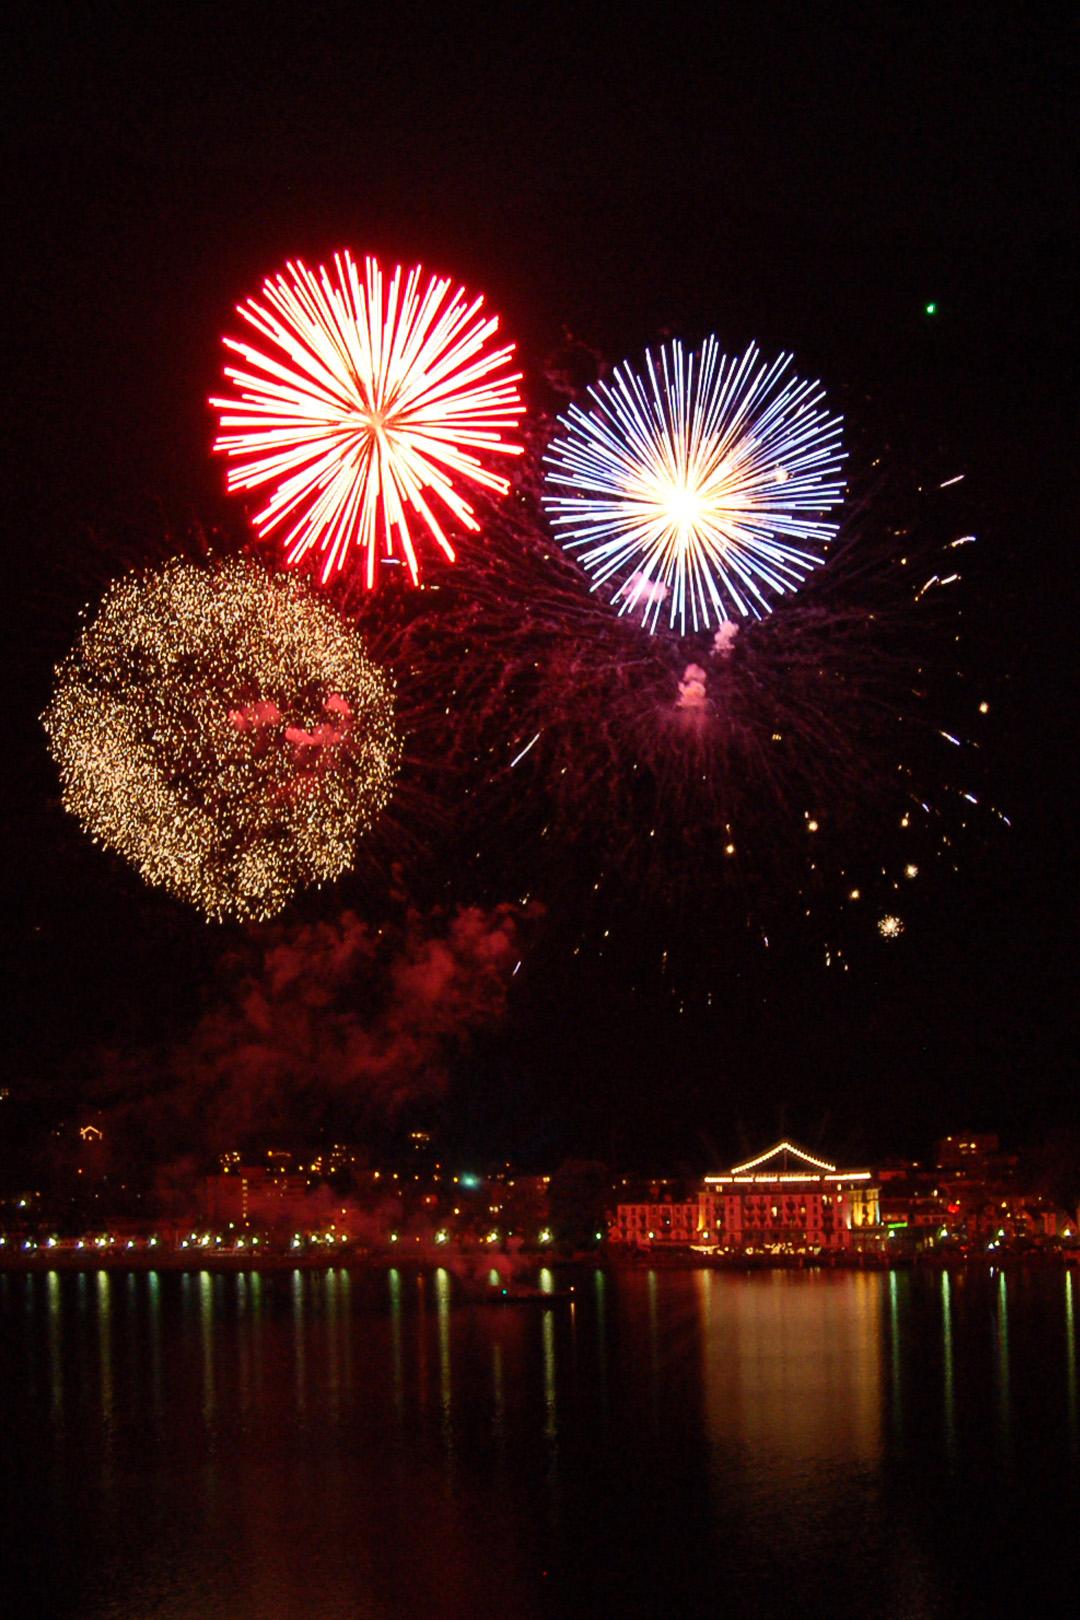 Brunnen New Year's Eve fireworks display